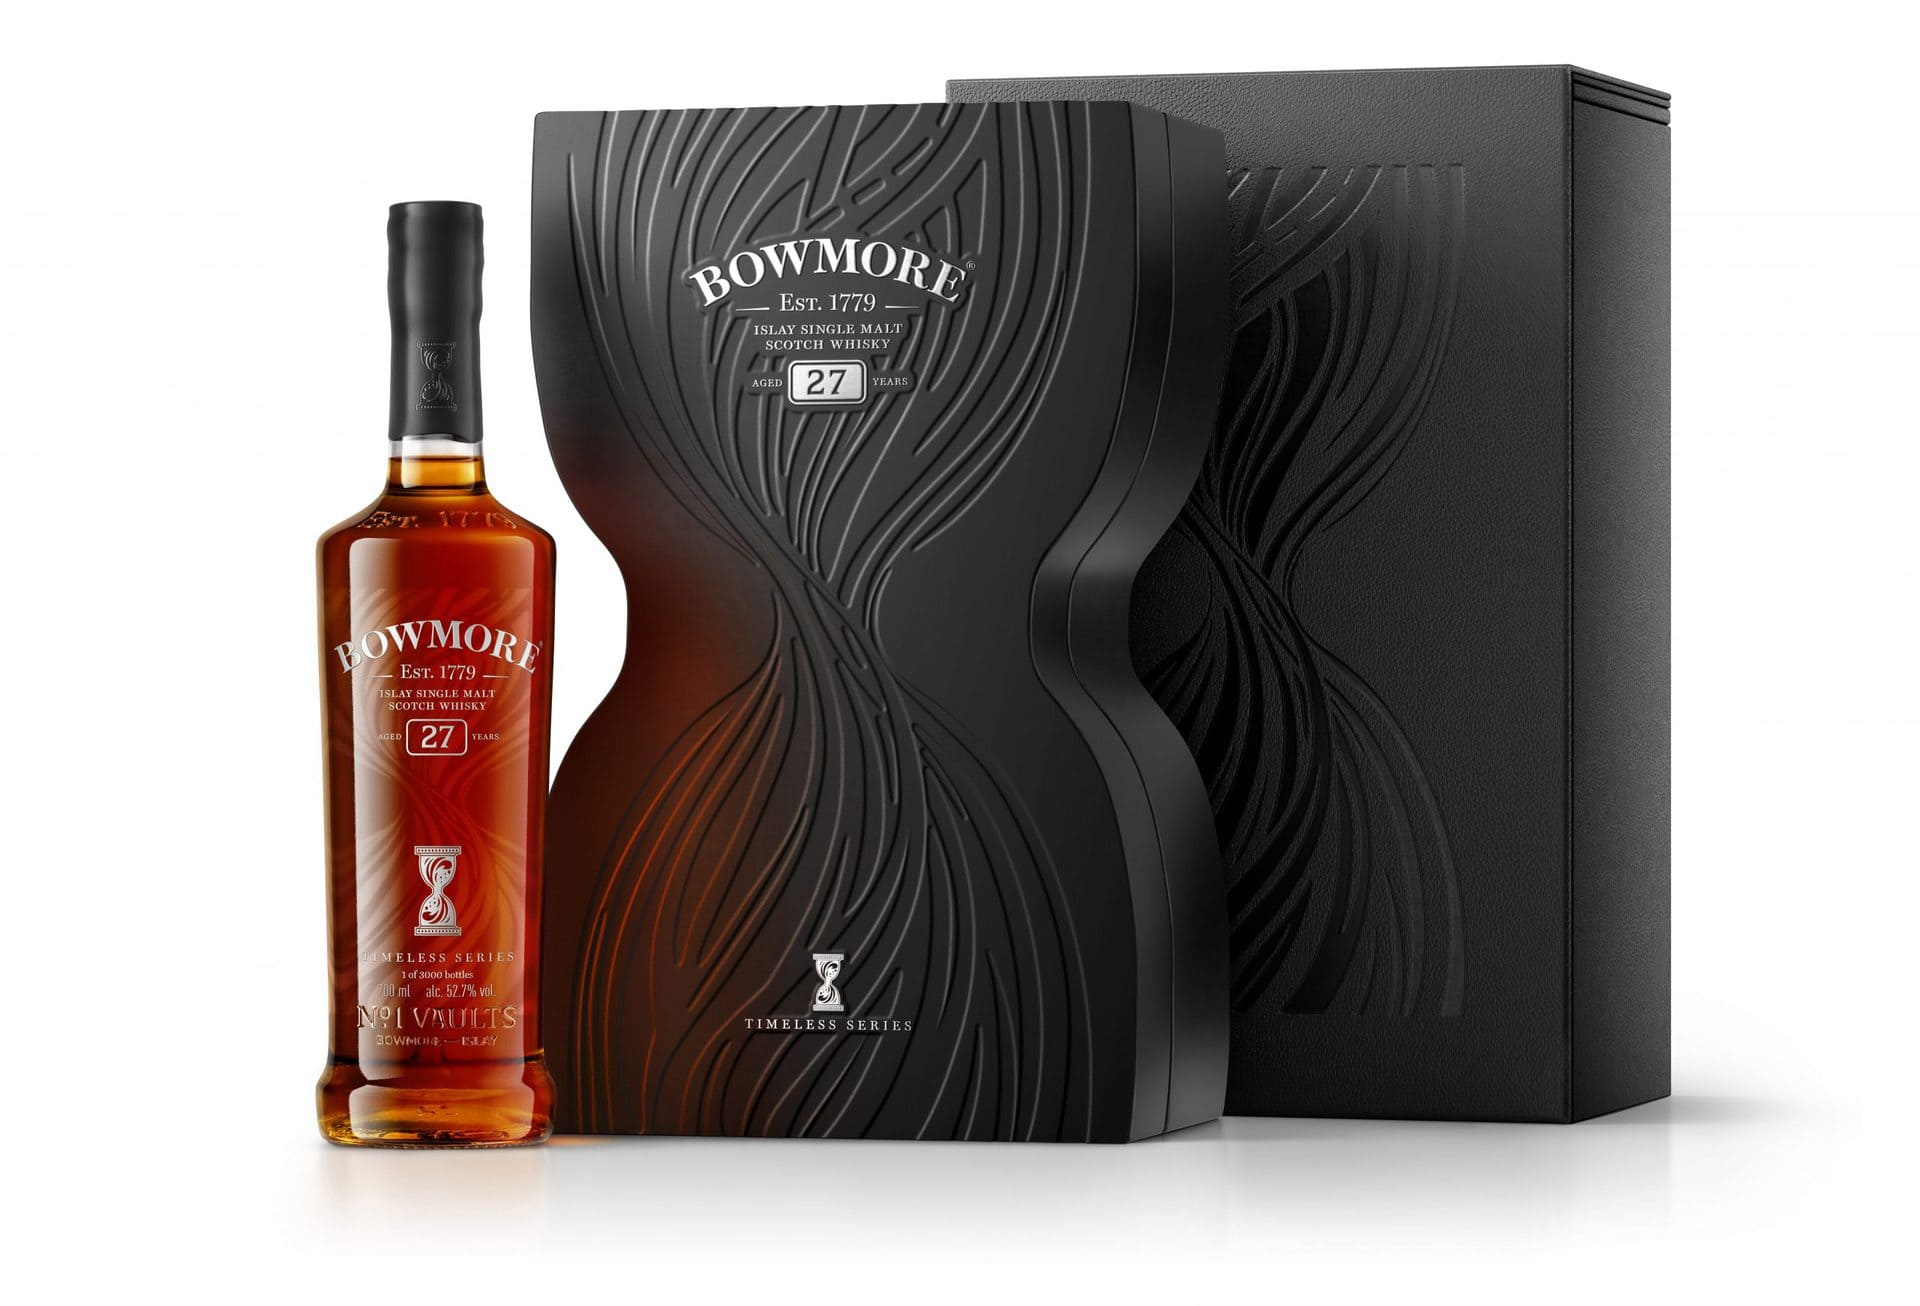 Bowmore-27-Timeless 700ml-NO-PROOF-Bottle-next-to-Inner-Closed-Box-Tertiary-Box v2 RGB300